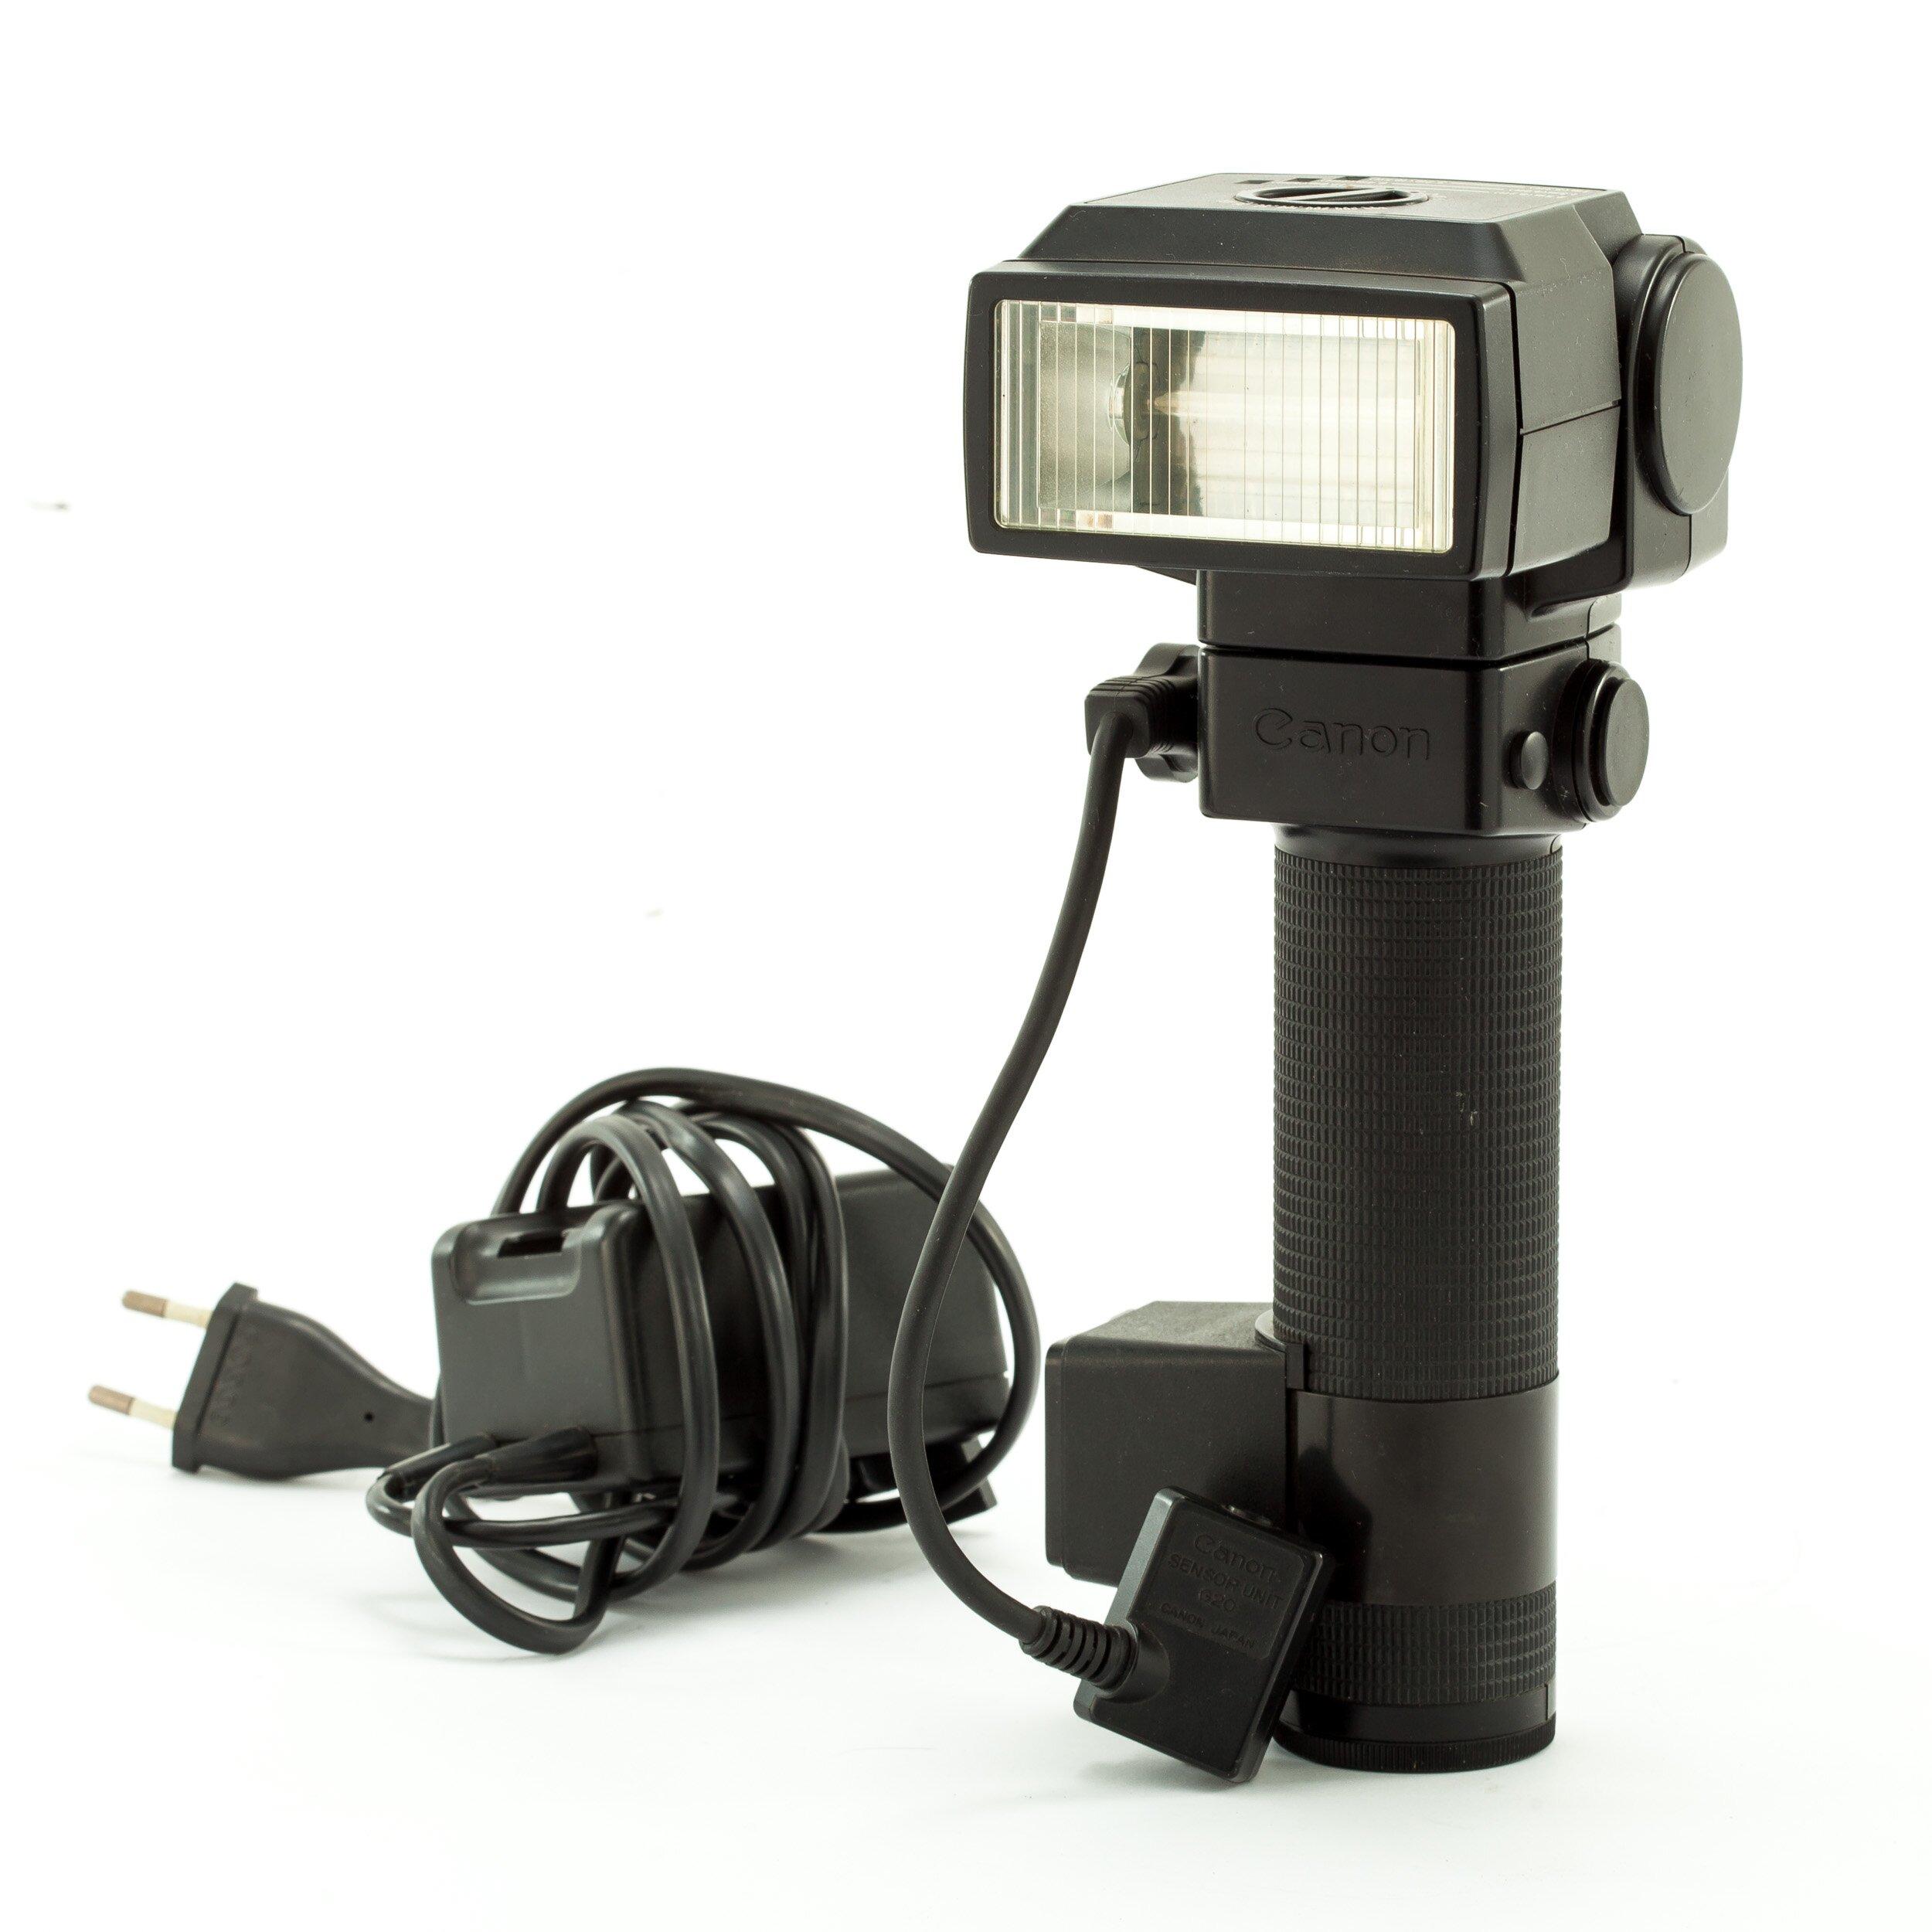 Canon Speedlite 533G Blitz